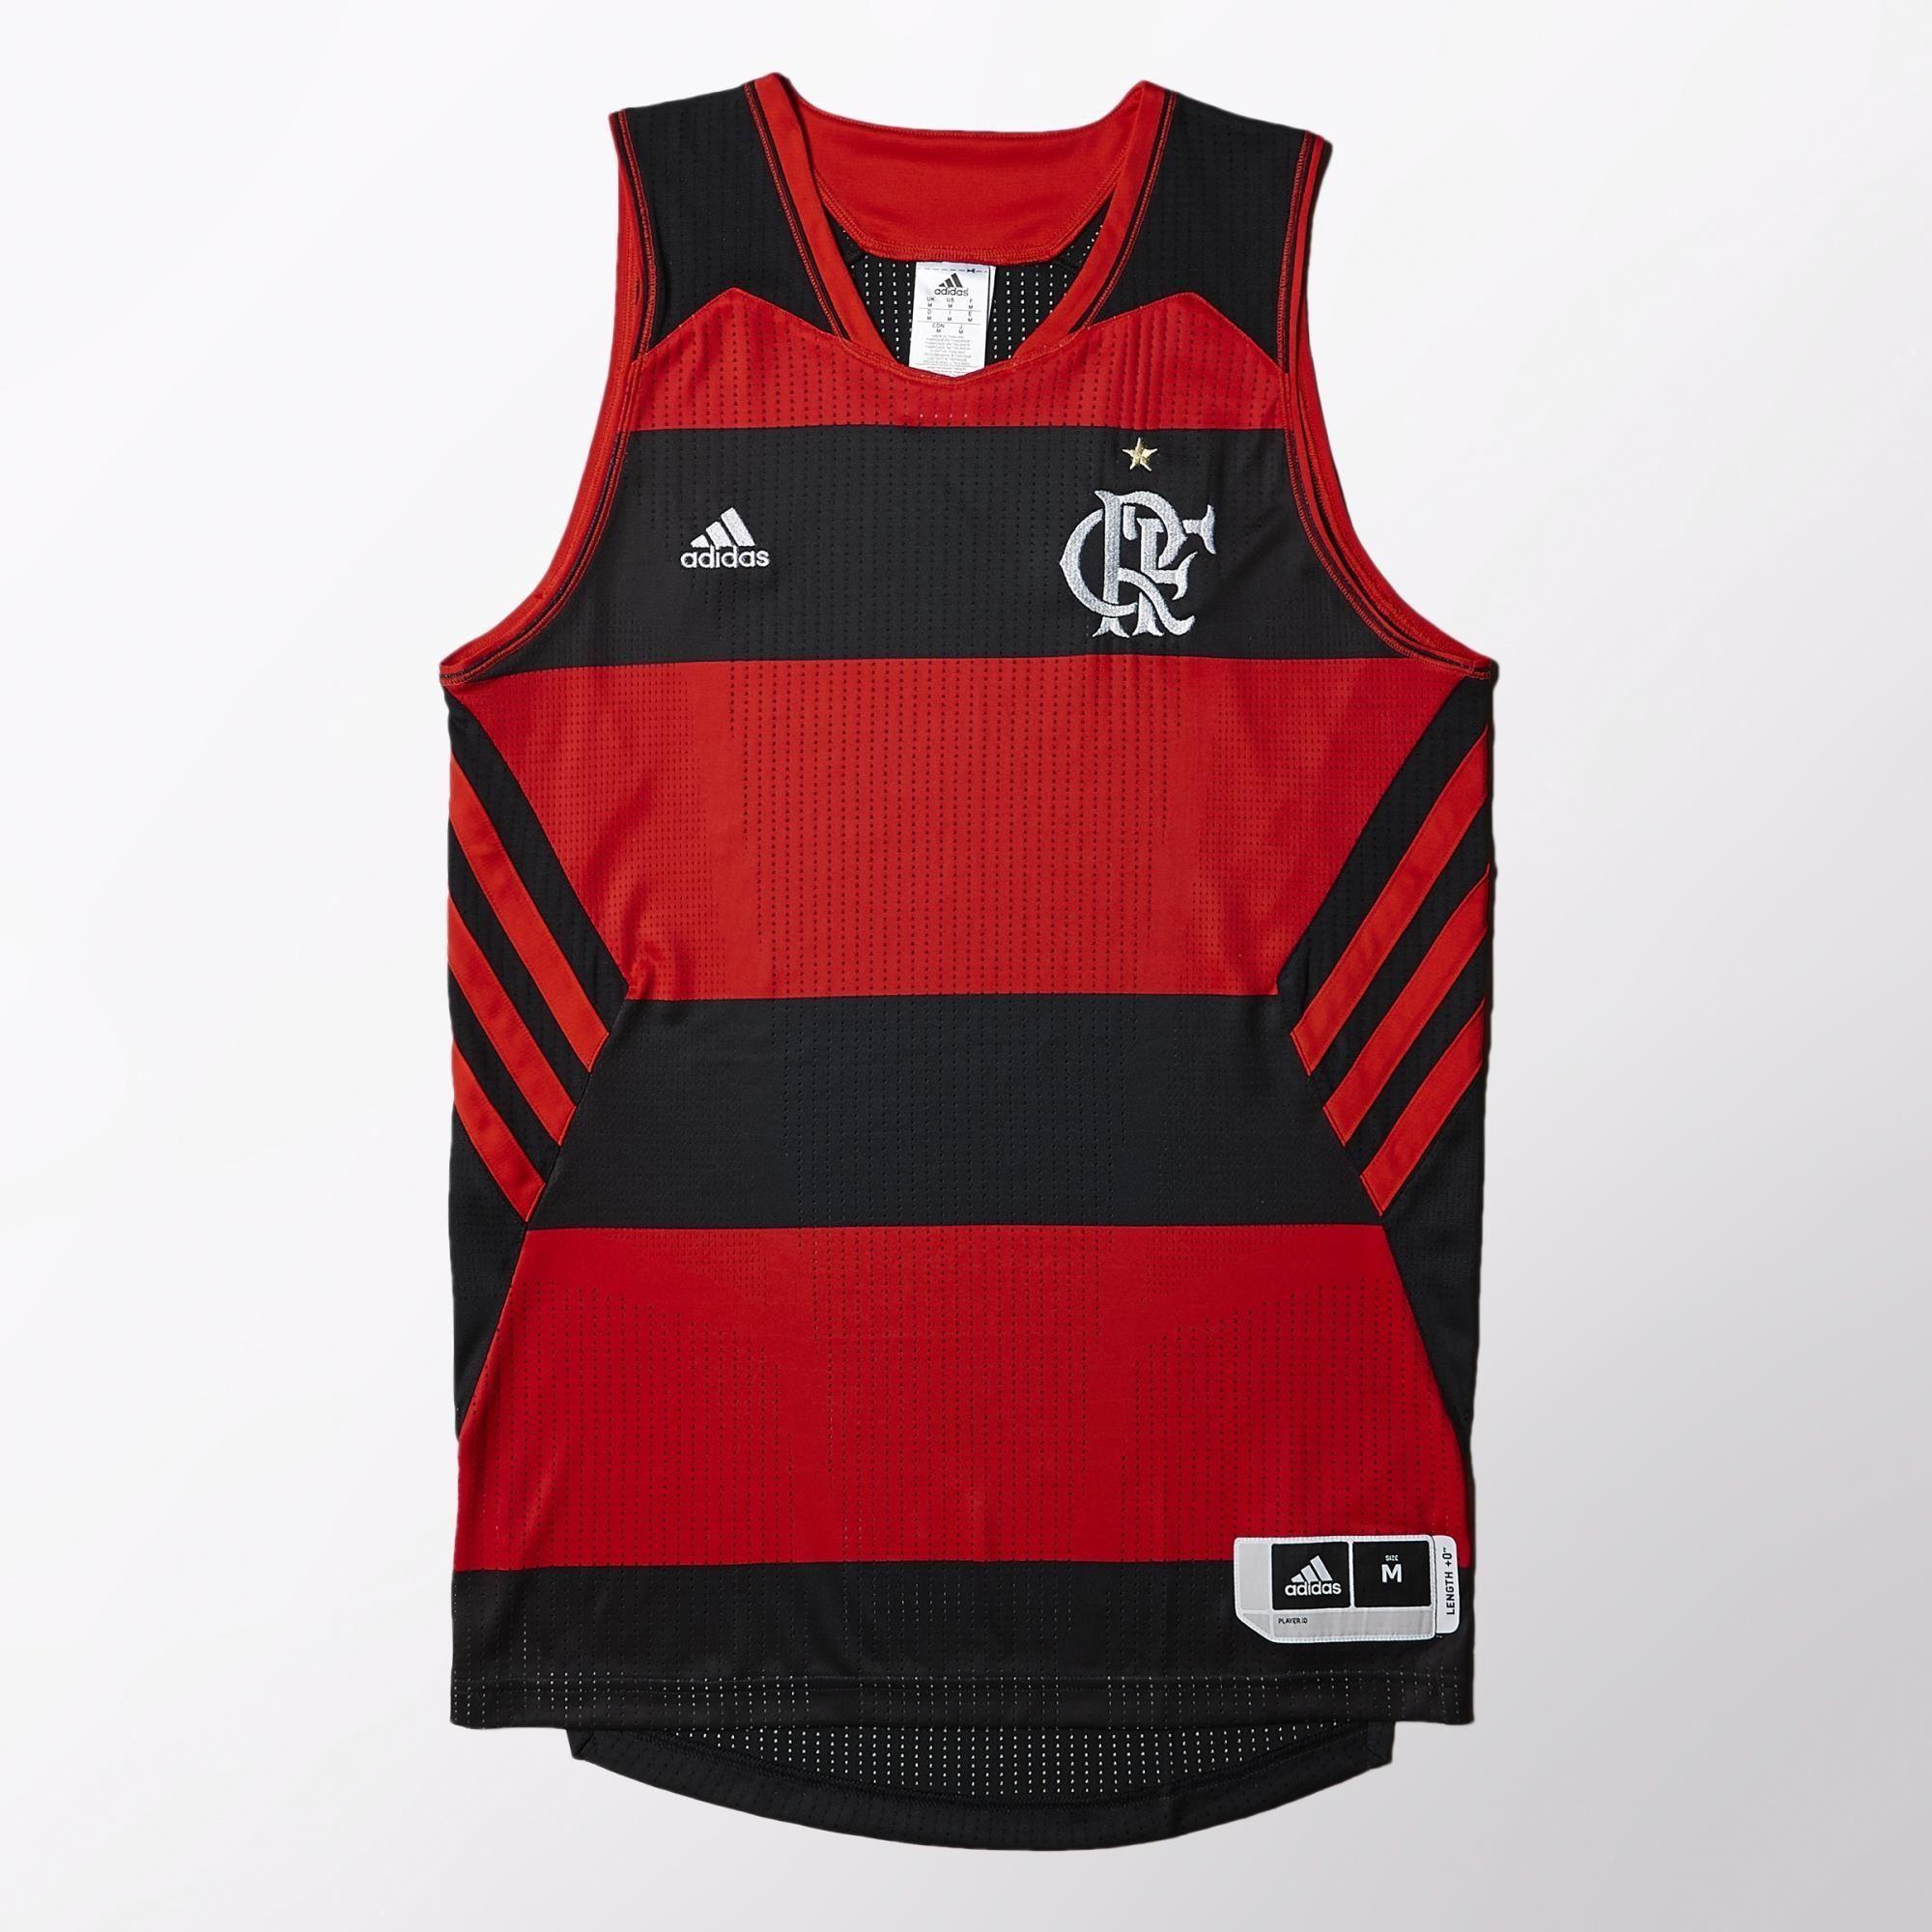 163a709509969 adidas - Regata Basquete Flamengo